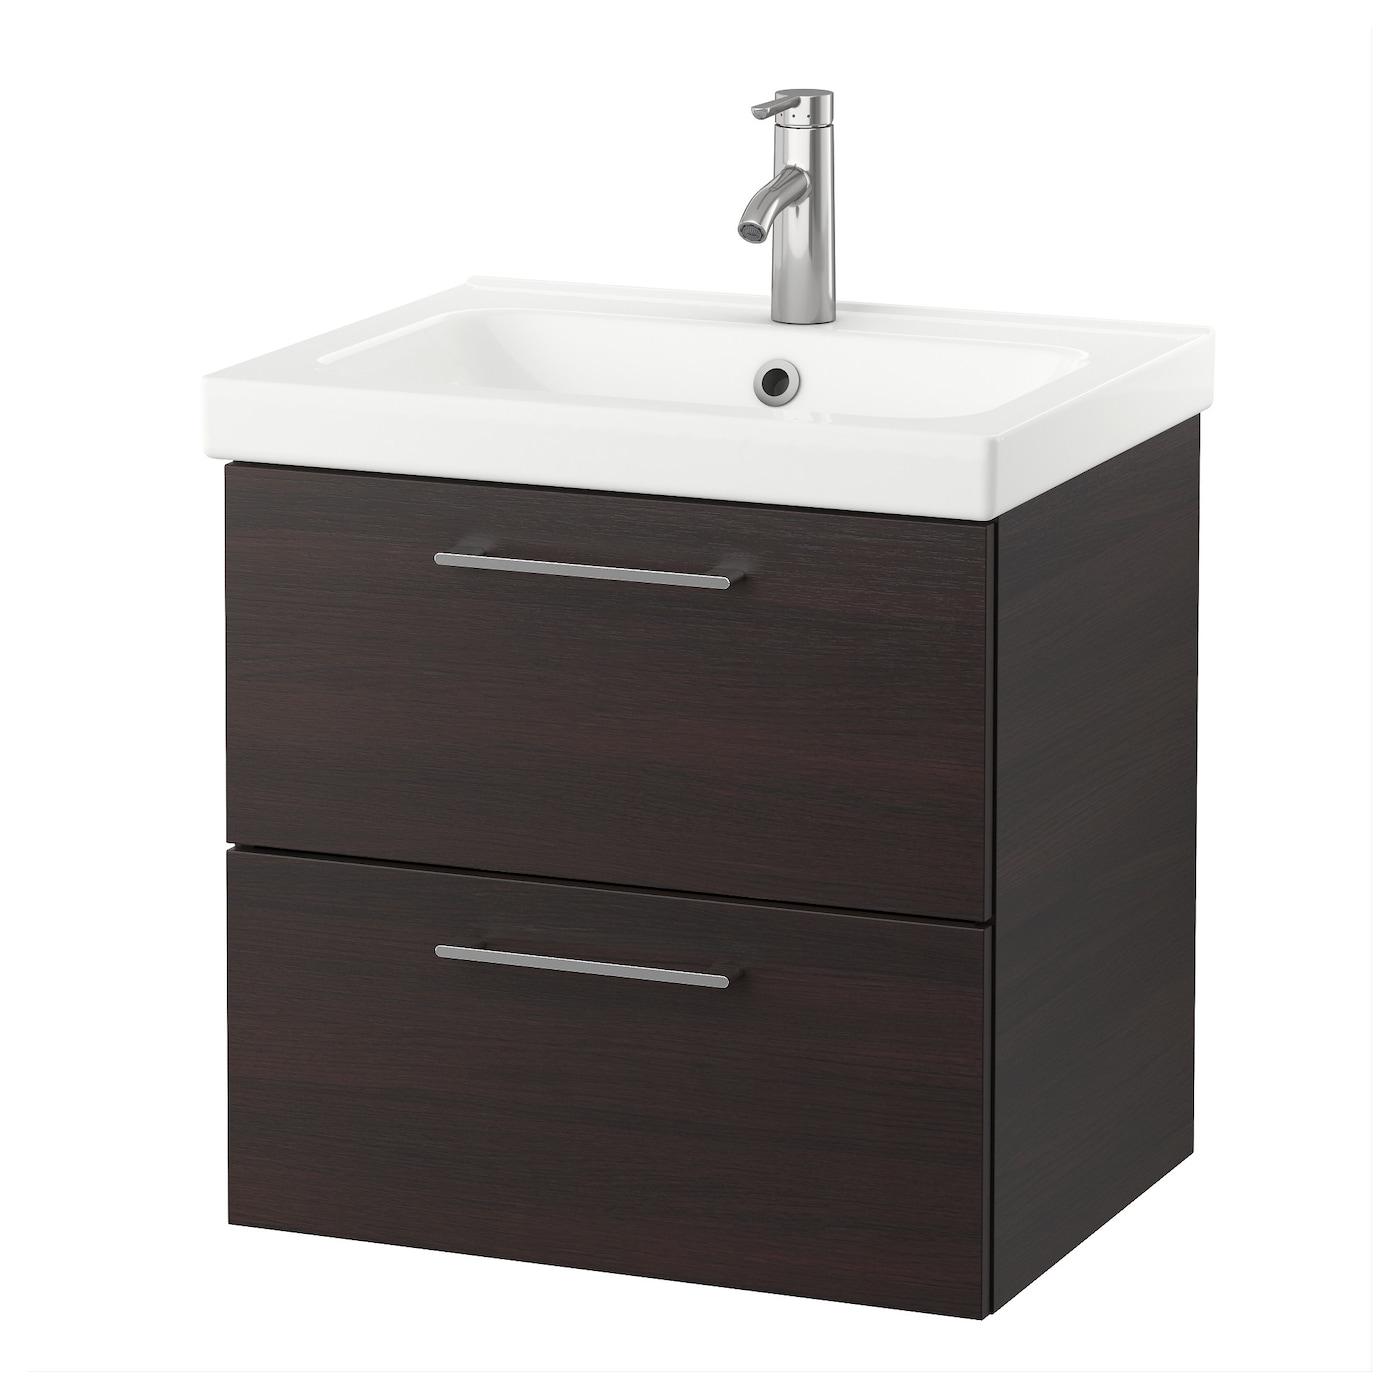 odensvik godmorgon wash stand with 2 drawers black brown 60x49x64 cm ikea. Black Bedroom Furniture Sets. Home Design Ideas